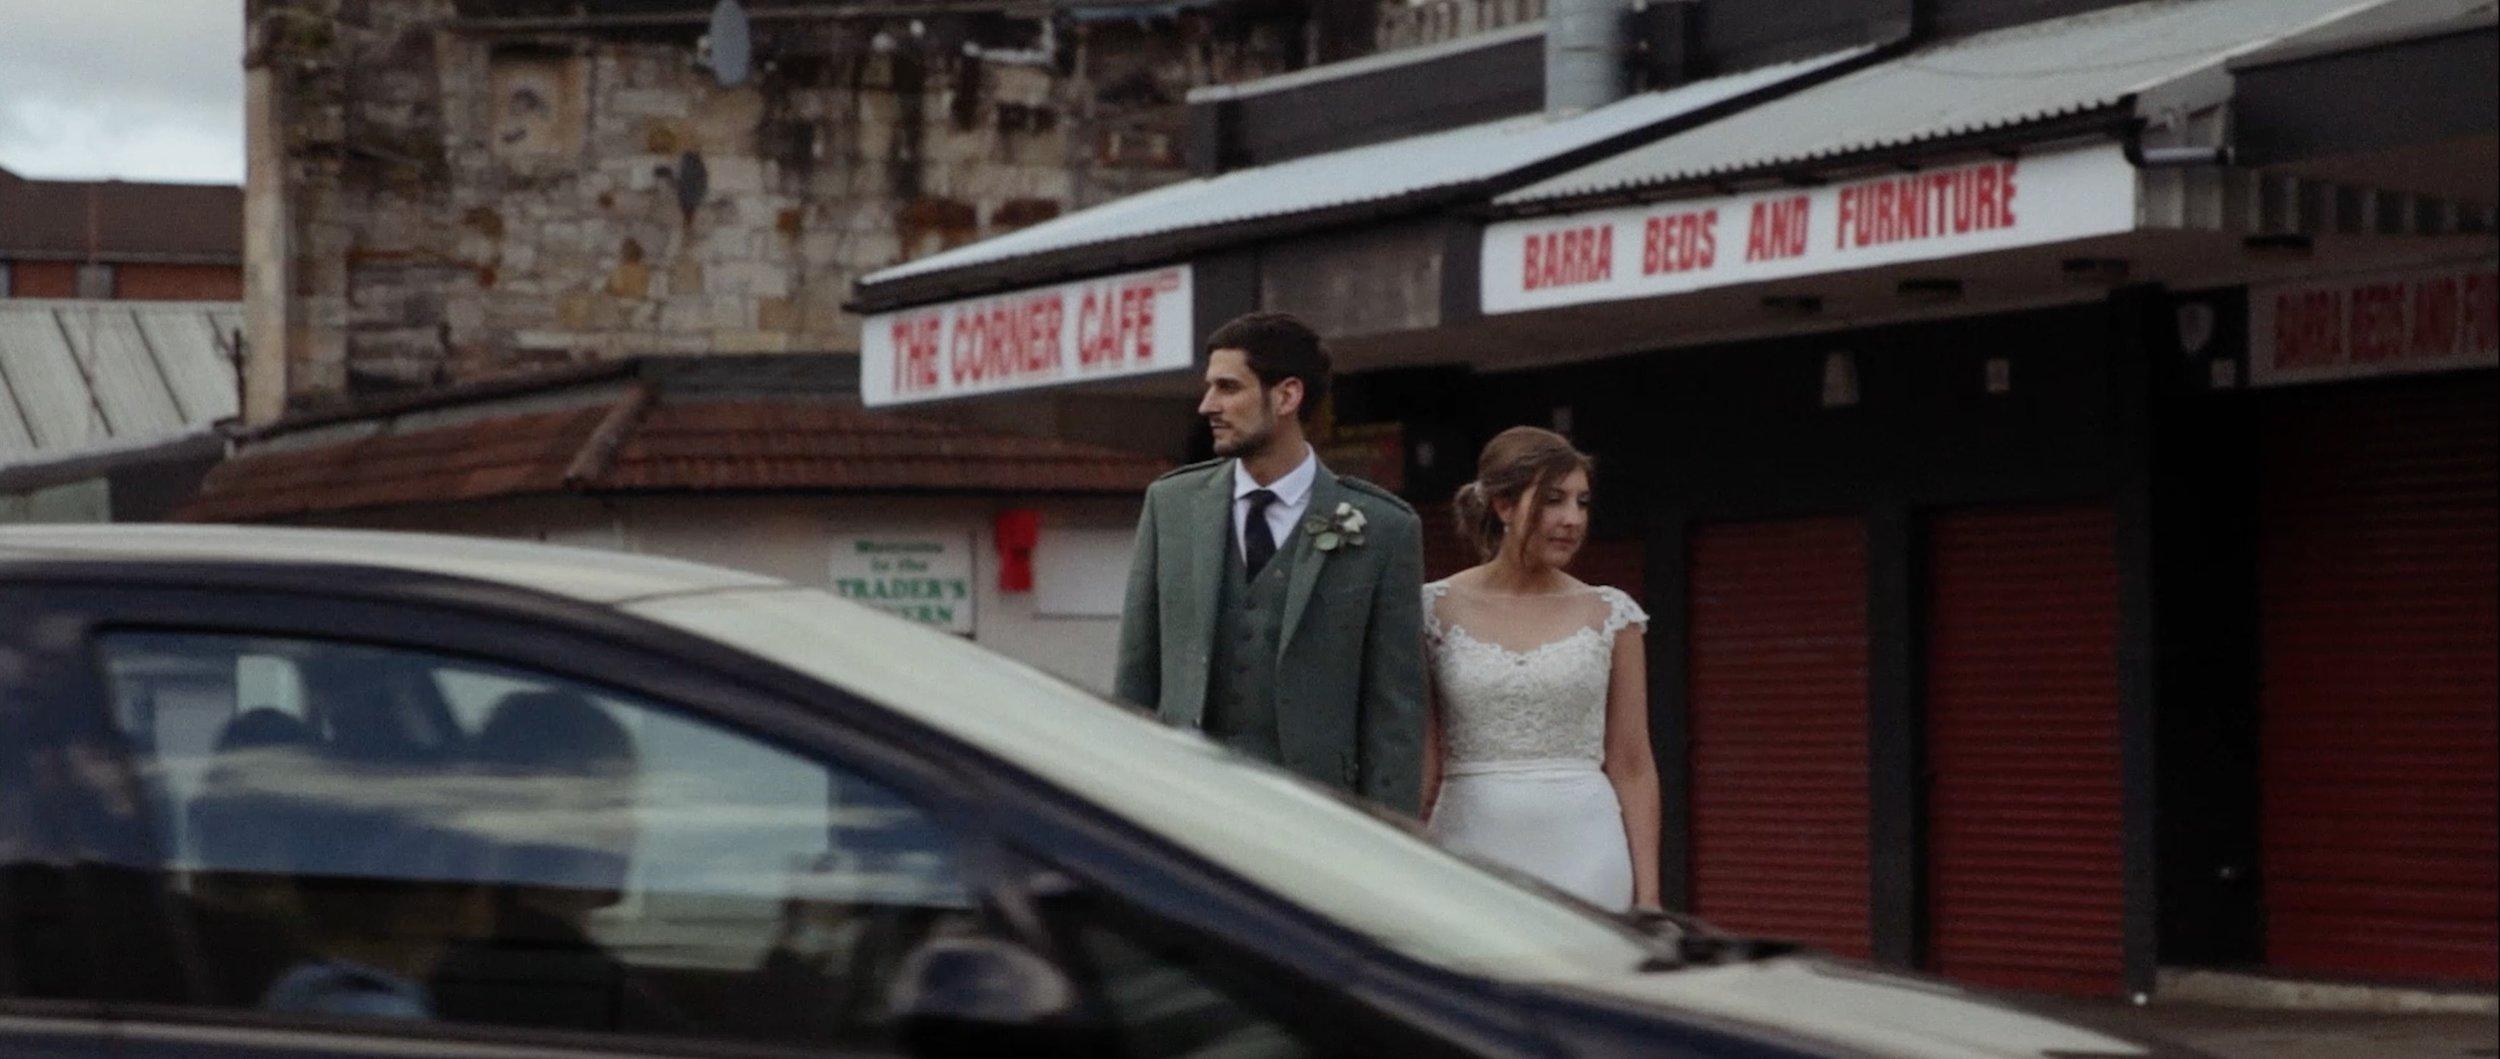 pratis-farm-wedding-videographer_LL_05.jpg